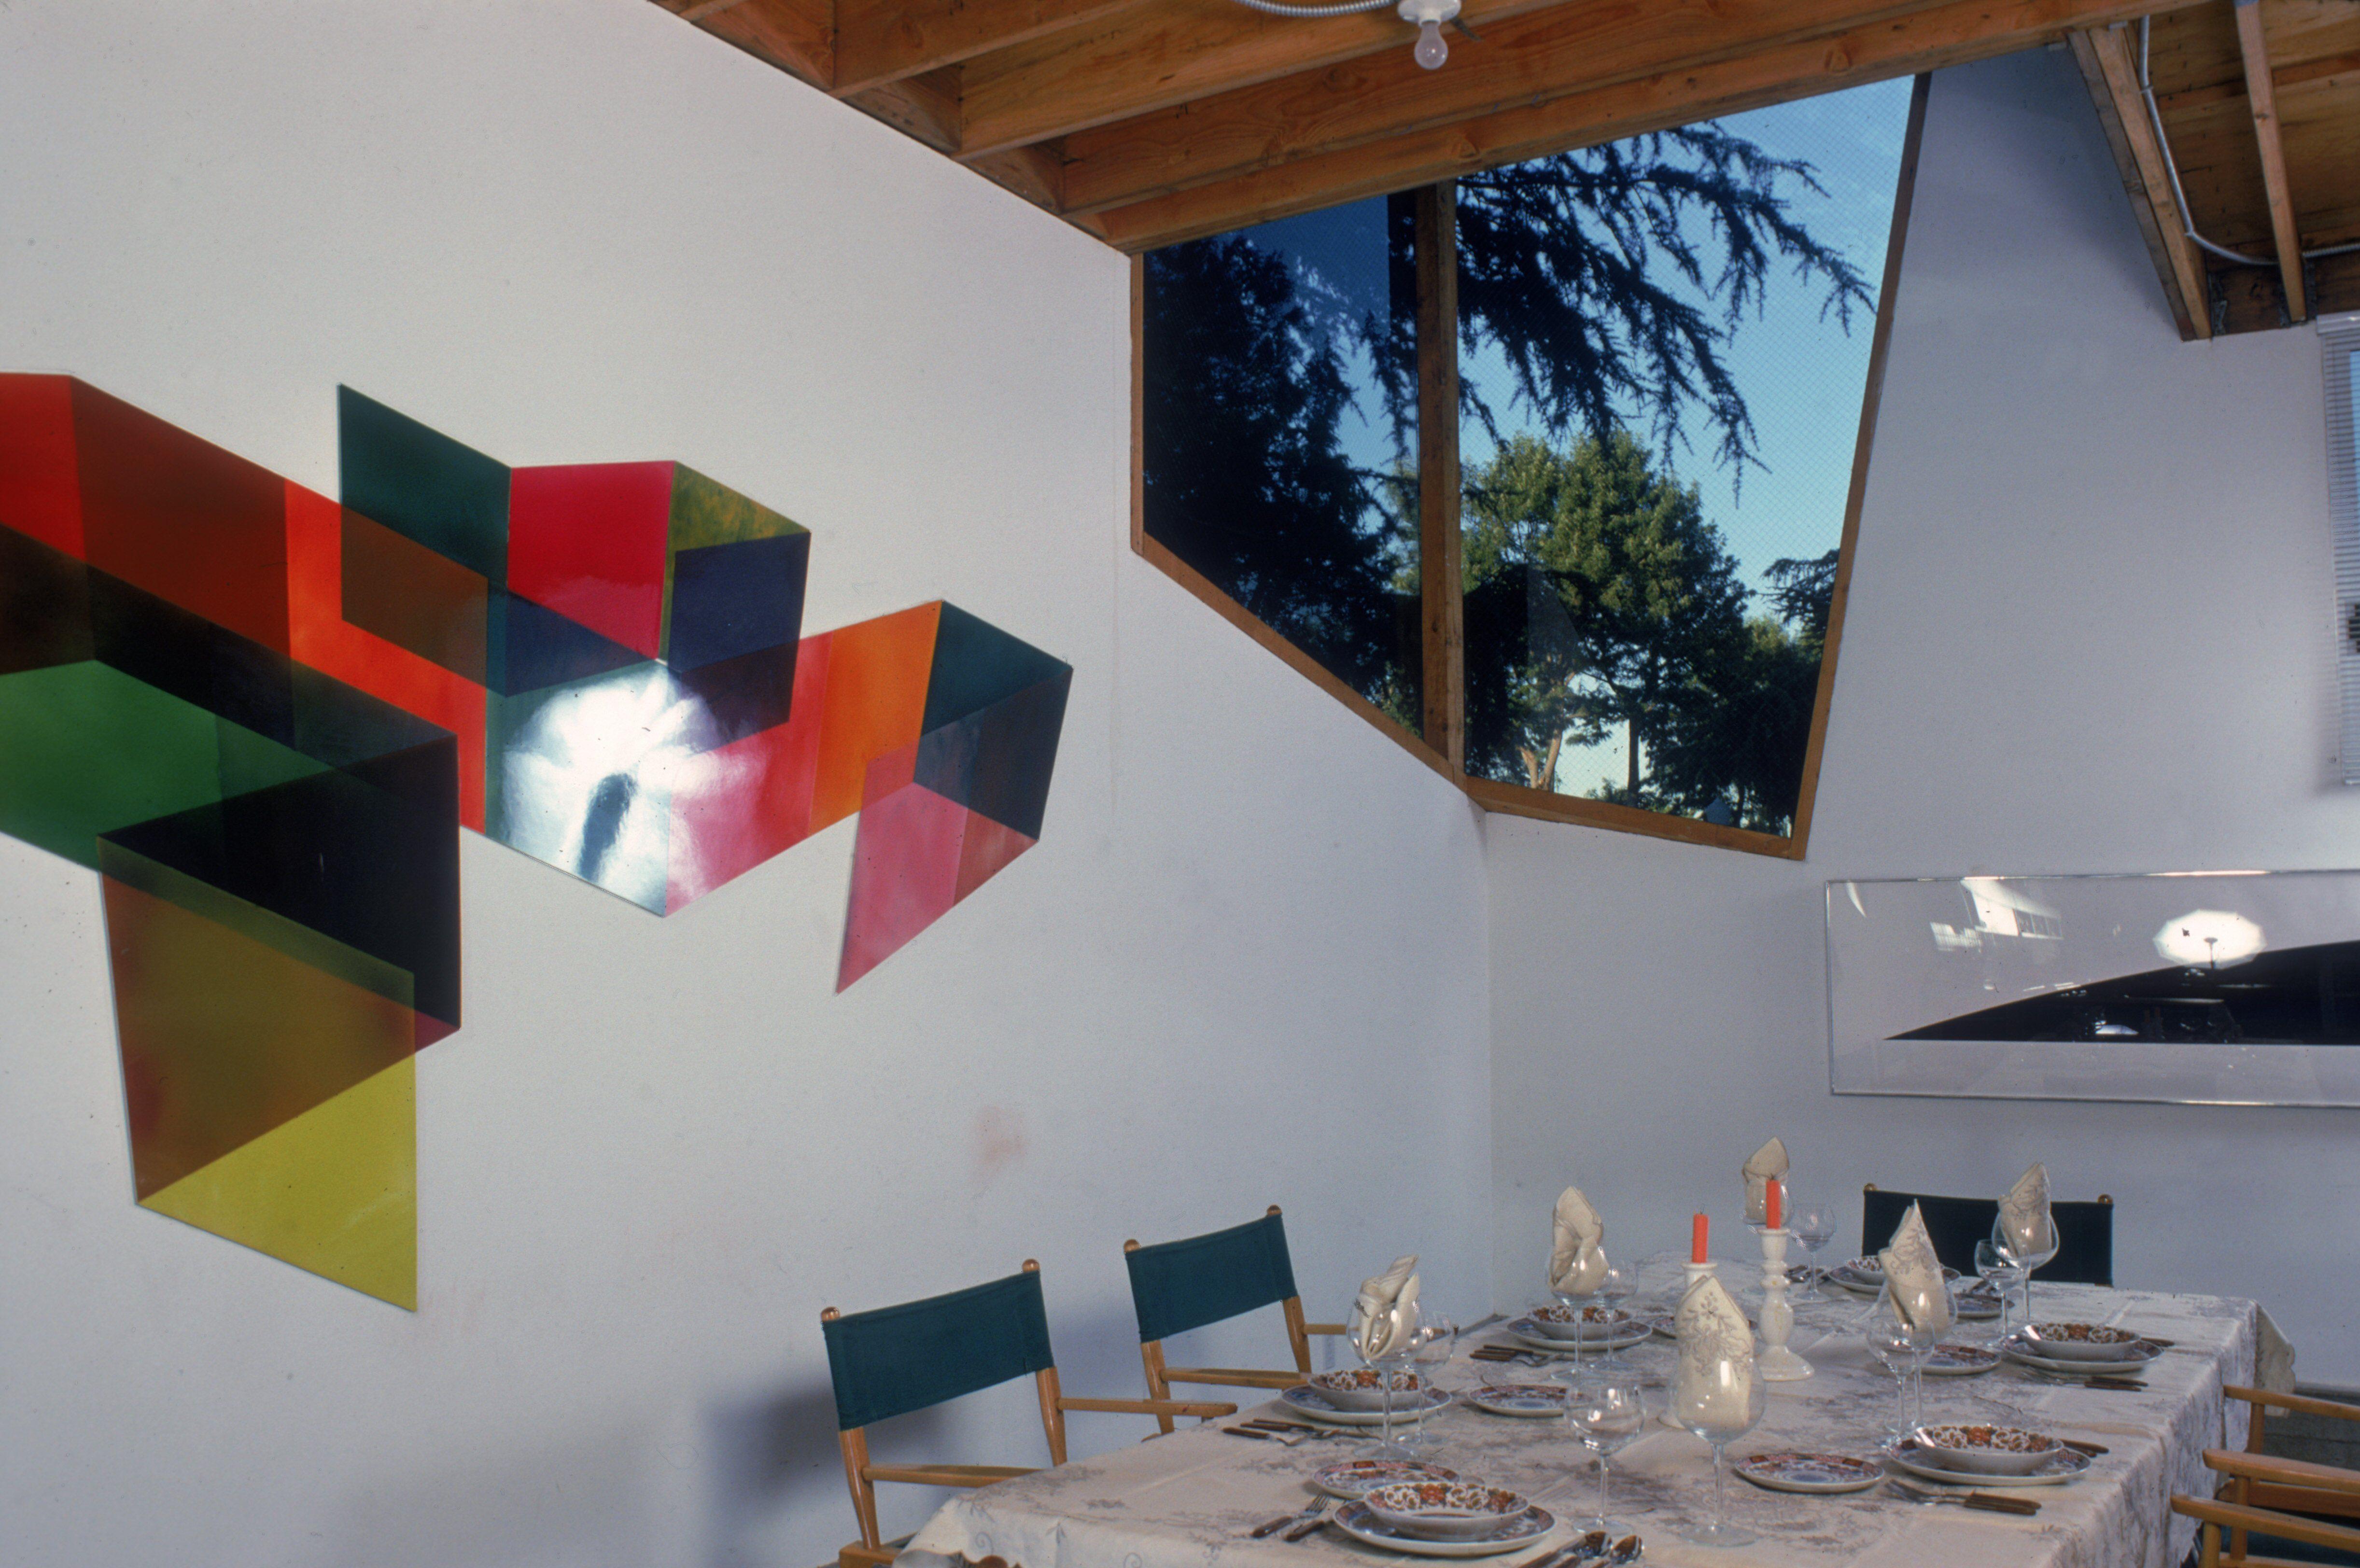 nterior dining area of Frank Gehry's house, Santa Monica, California